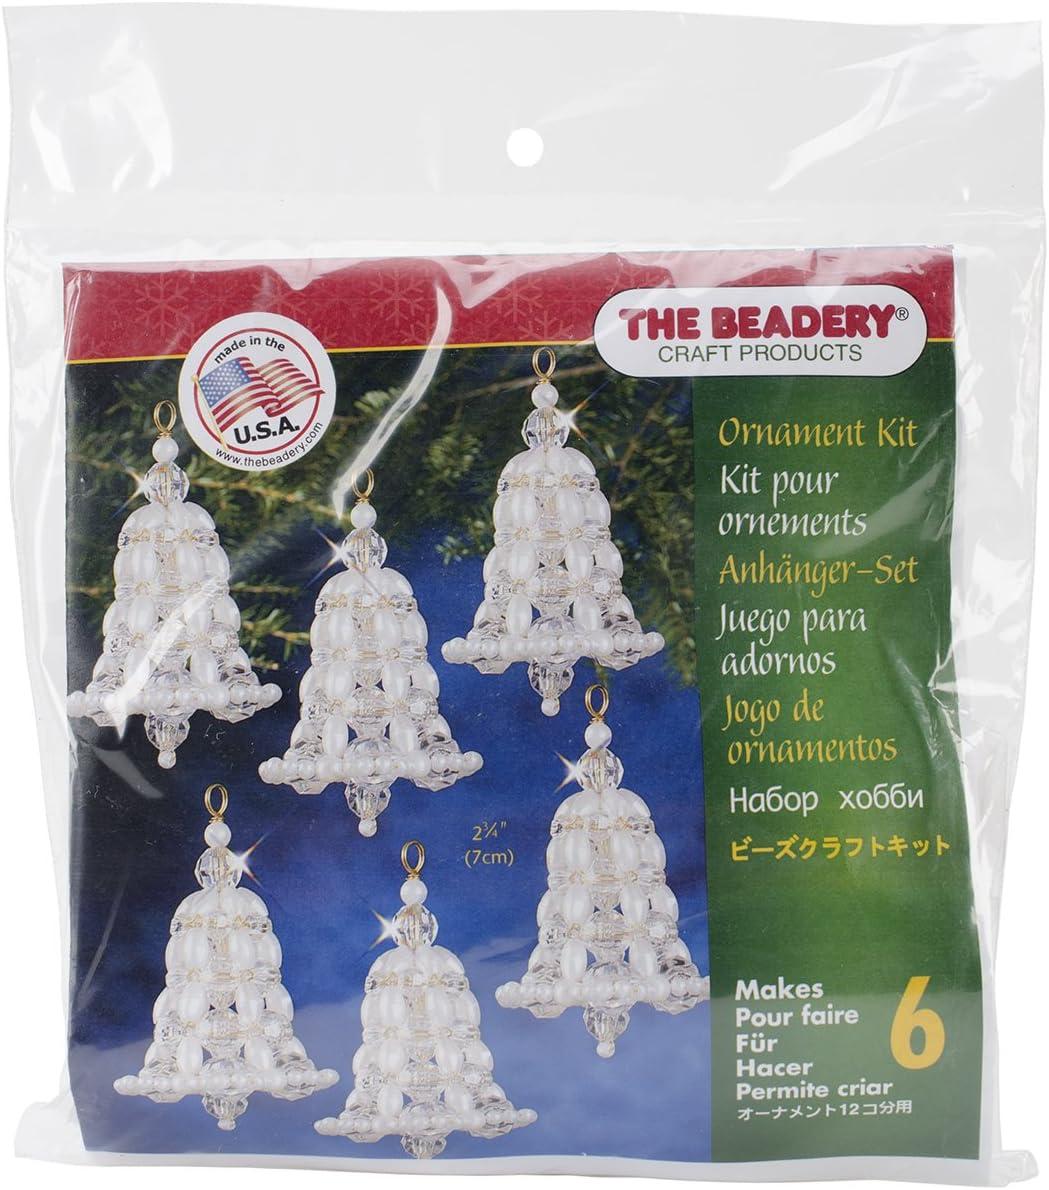 Holiday Beaded Ornament Kit IRIDESCENT BUBBLES Christmas Ornaments Makes 8 NEW!